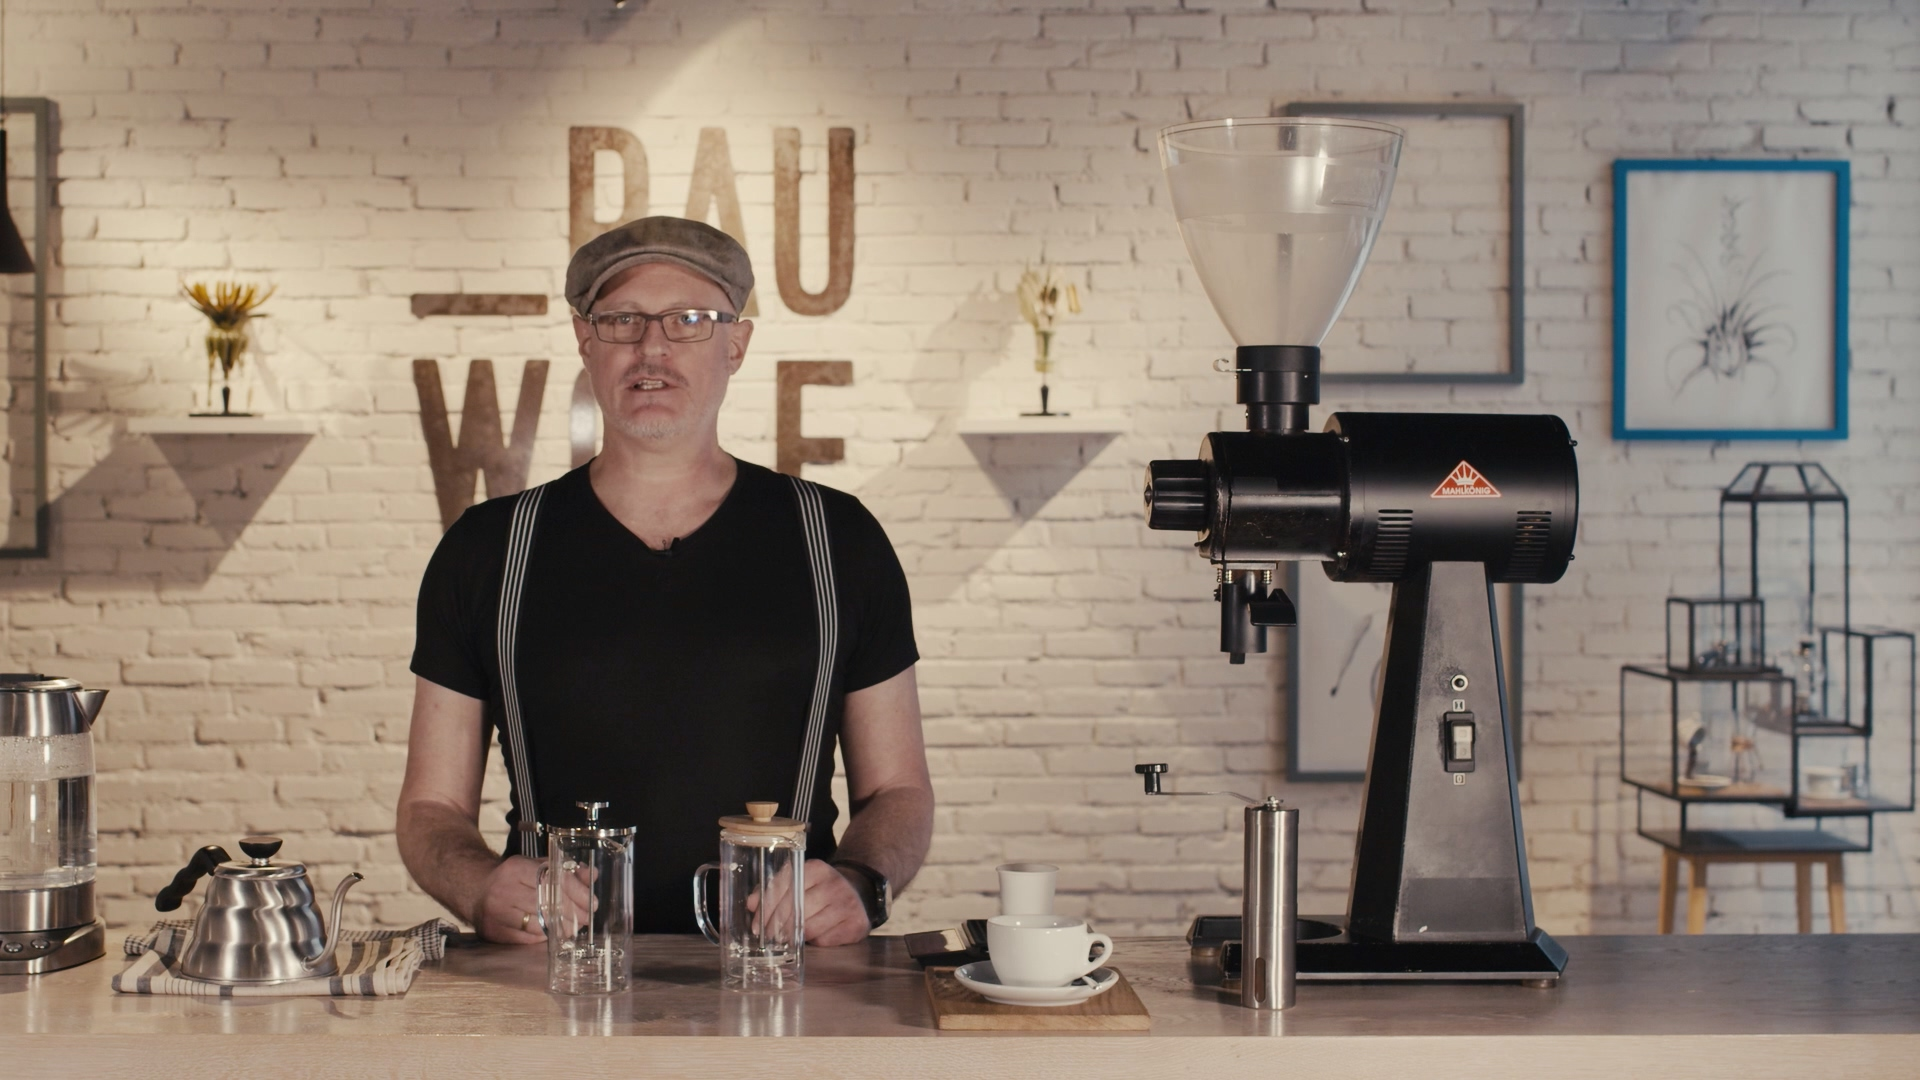 french-press-zubereitung-kaffee-mahlen